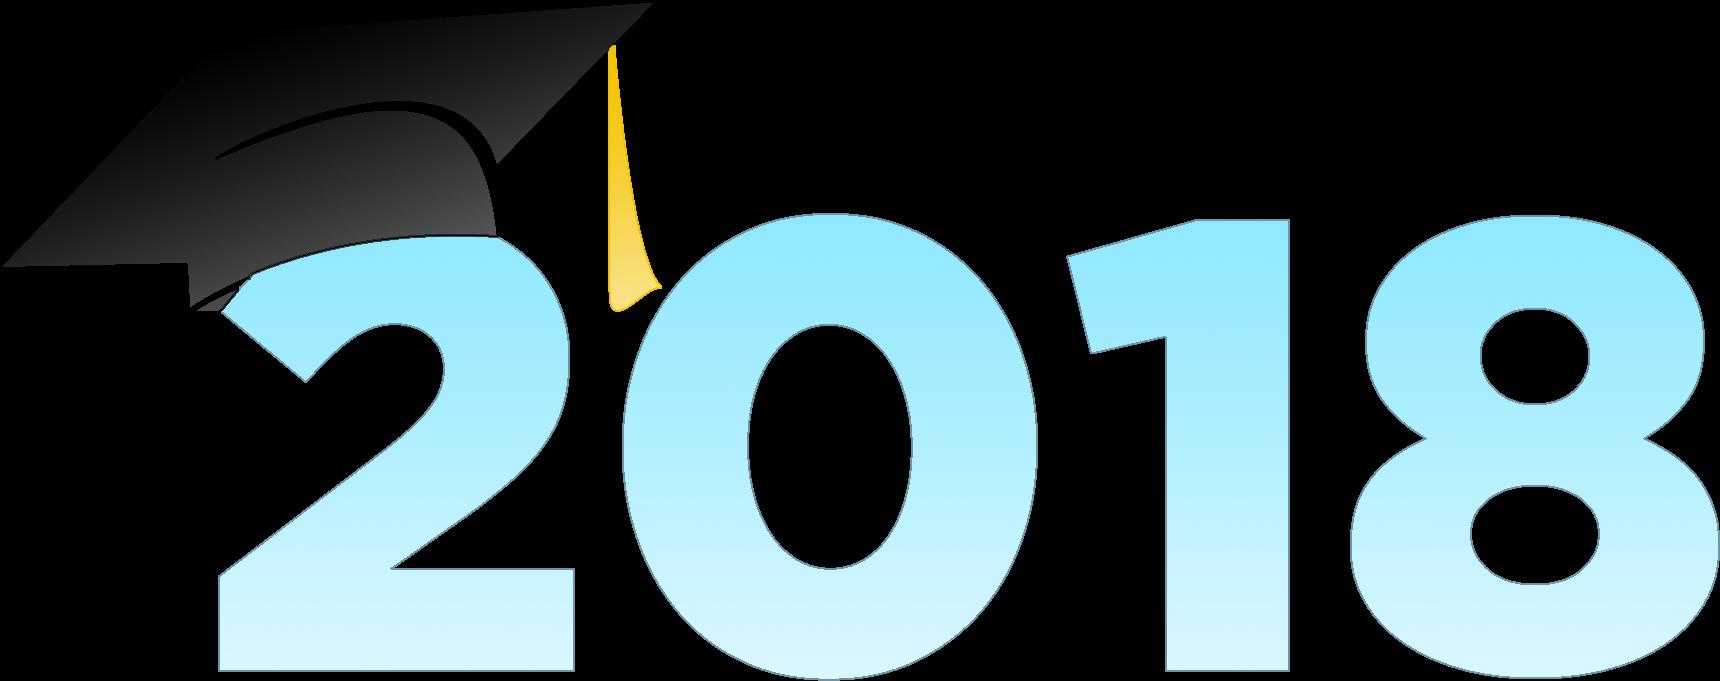 Graduate Clipart Grade 6 Graduation.